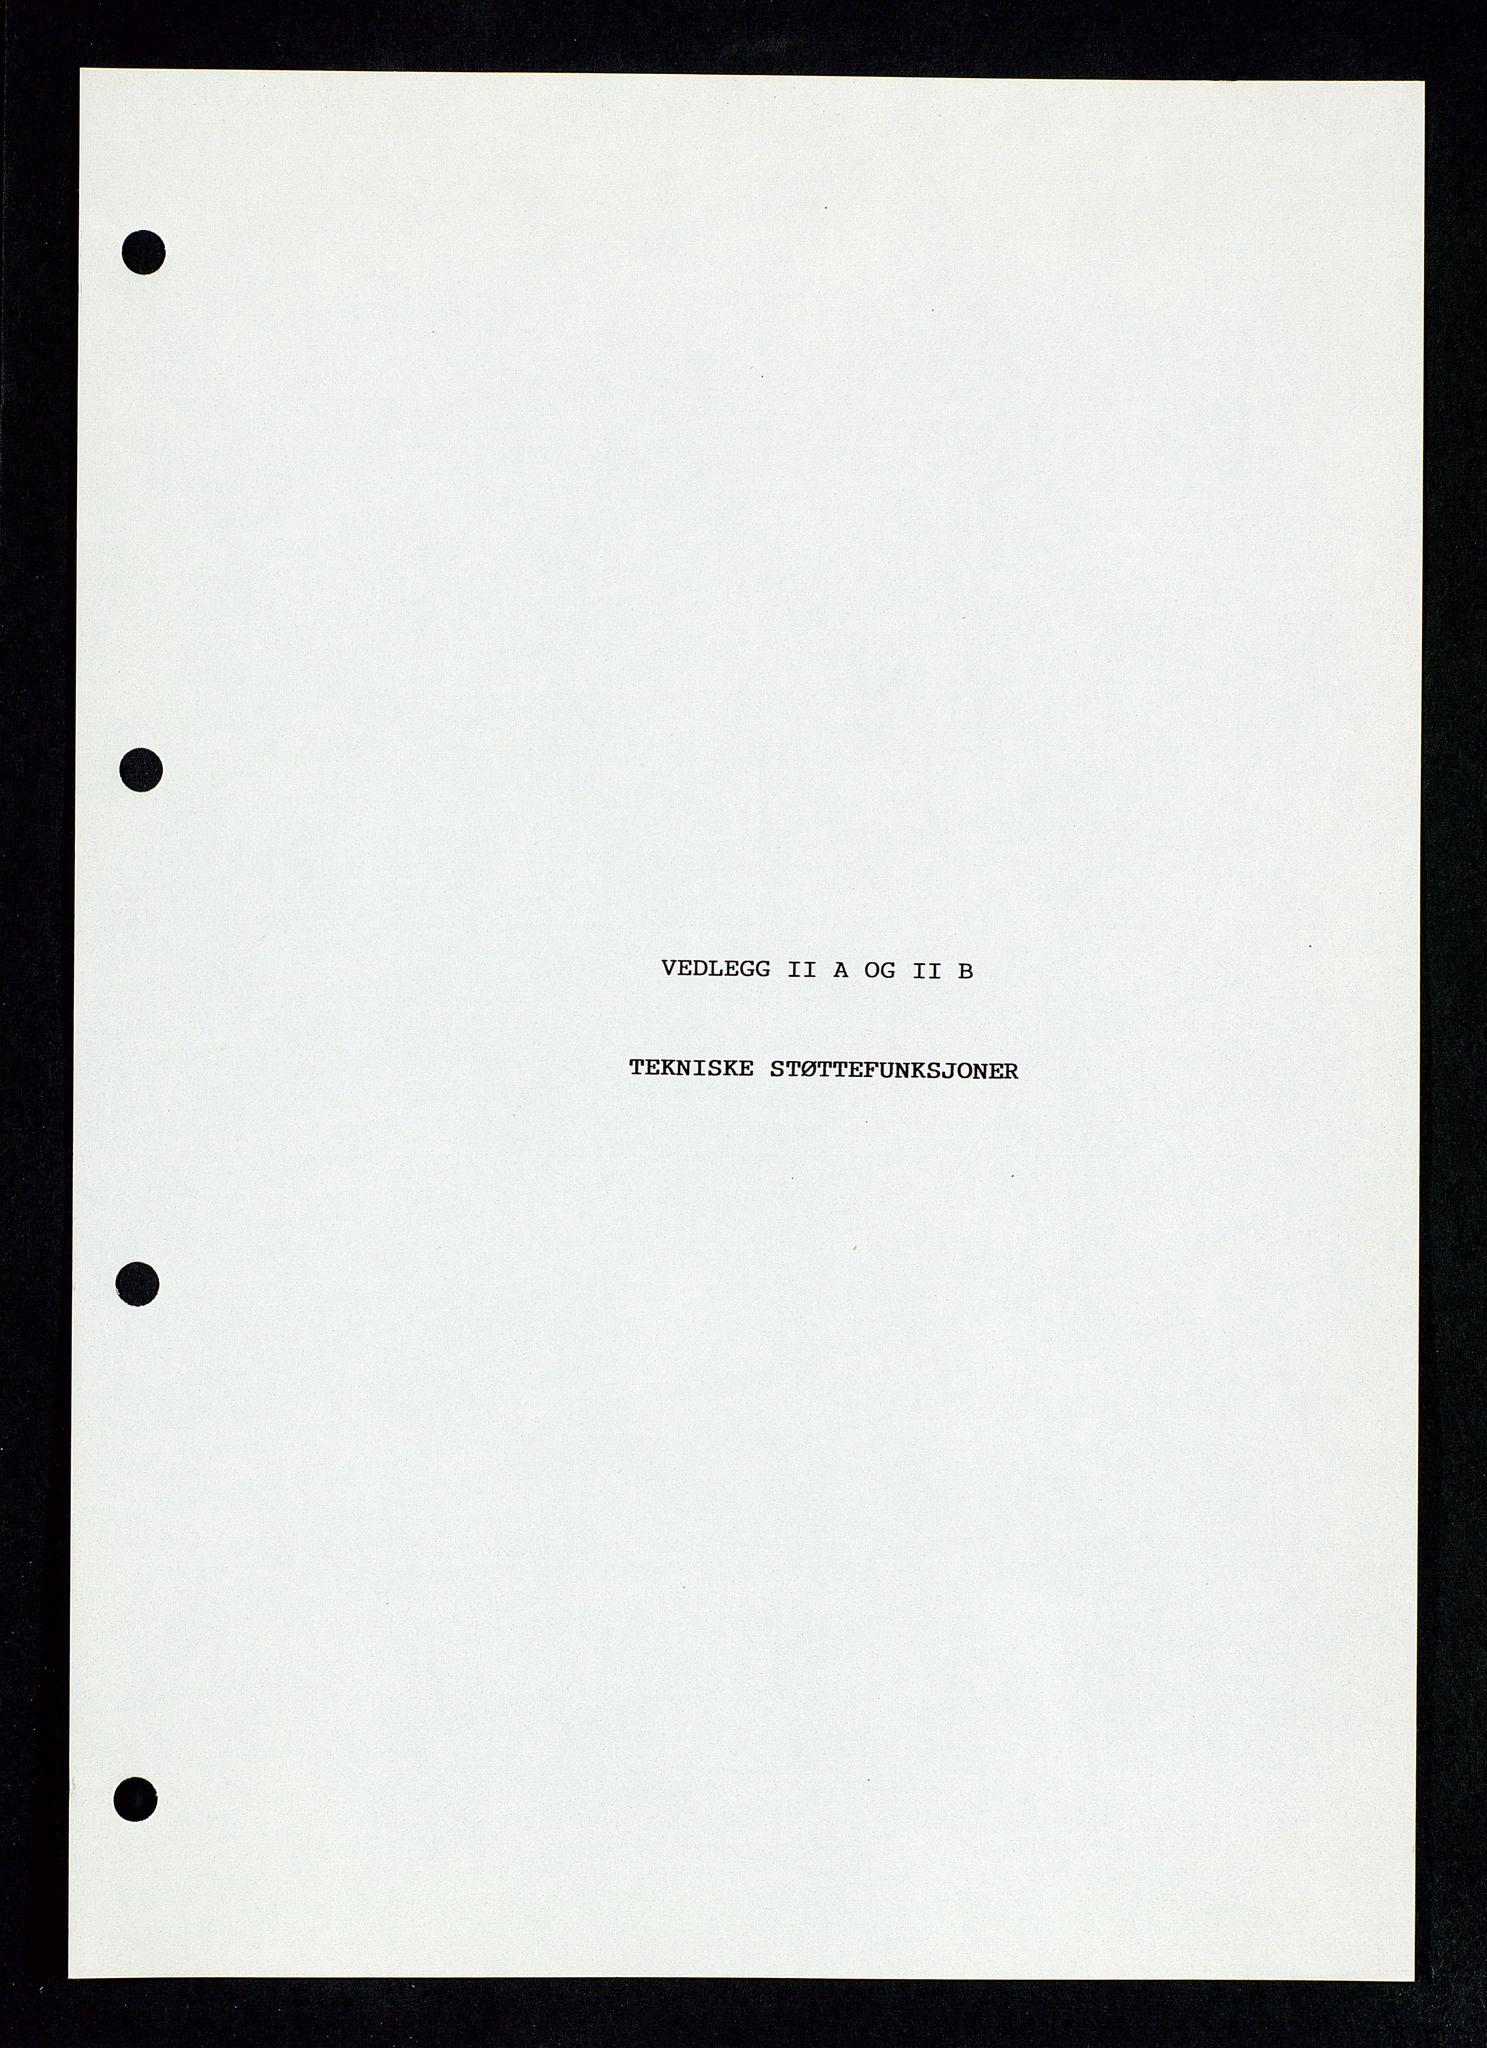 SAST, Pa 1339 - Statoil ASA, D/Dm/L0123: Rapporter, 1985-1988, s. 84